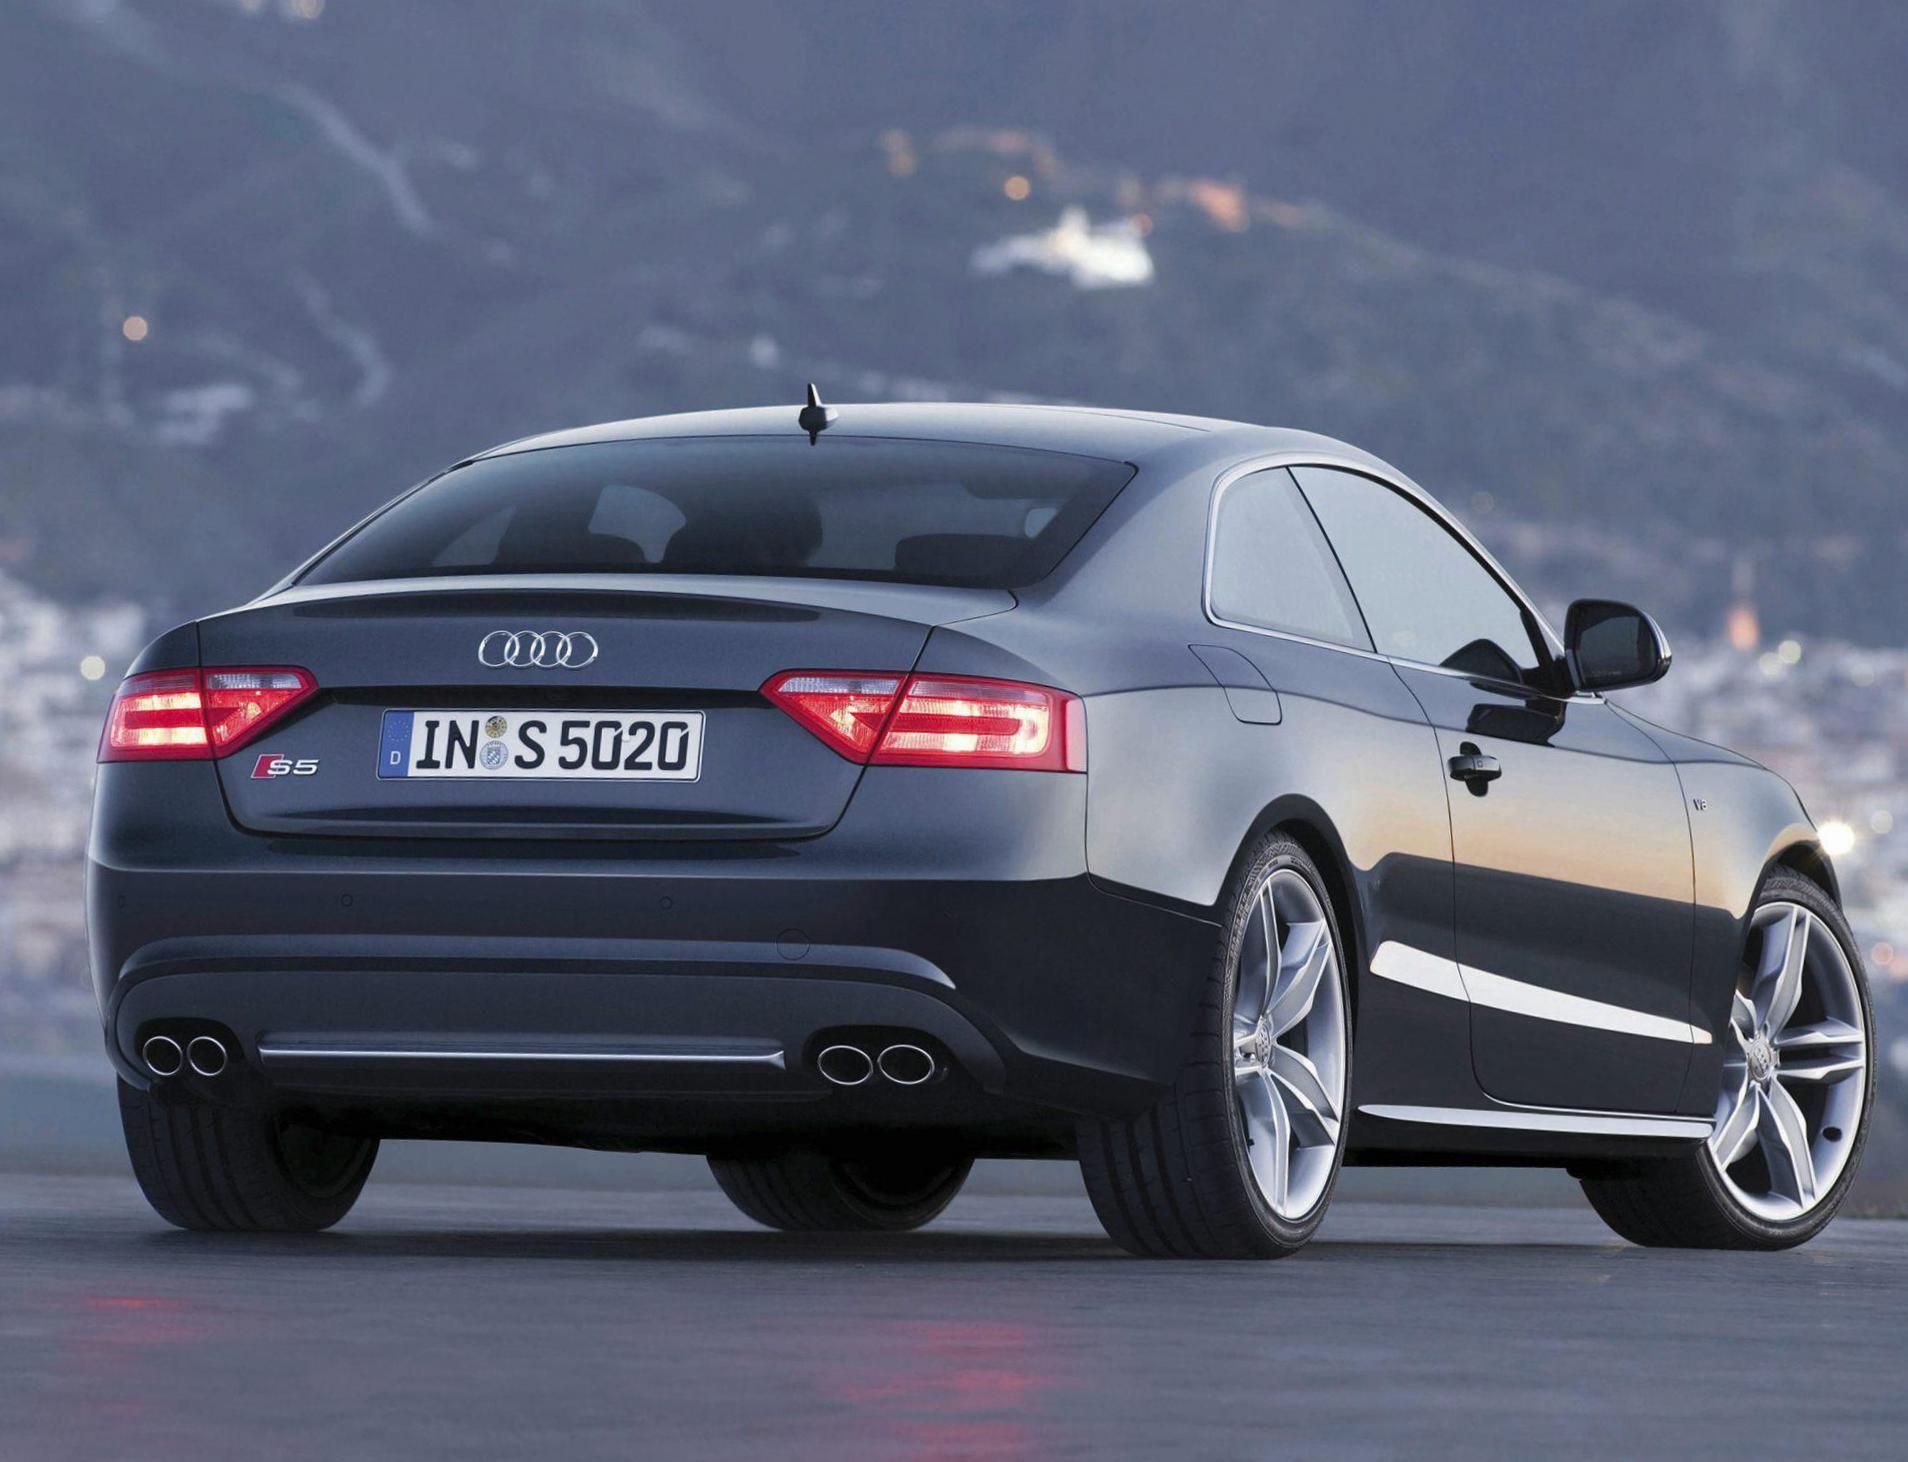 Audi S5 Coupe Photos And Specs Photo Audi S5 Coupe Prices And 23 Perfect Photos Of Audi S5 Coupe Audi S5 Audi Cars Audi